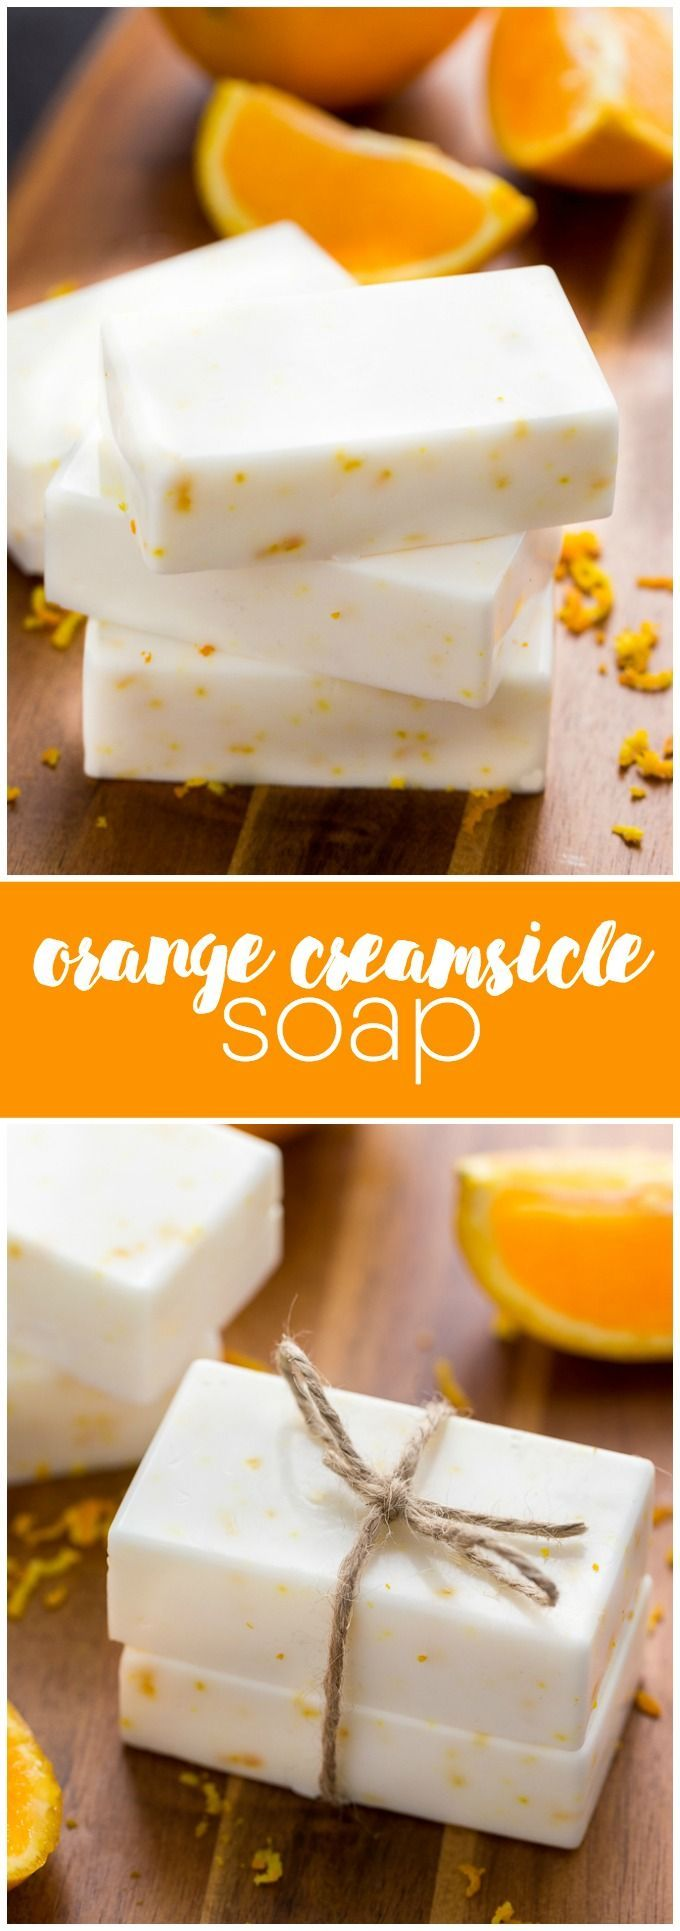 Orange Creamsicle Soap – Carla Hall